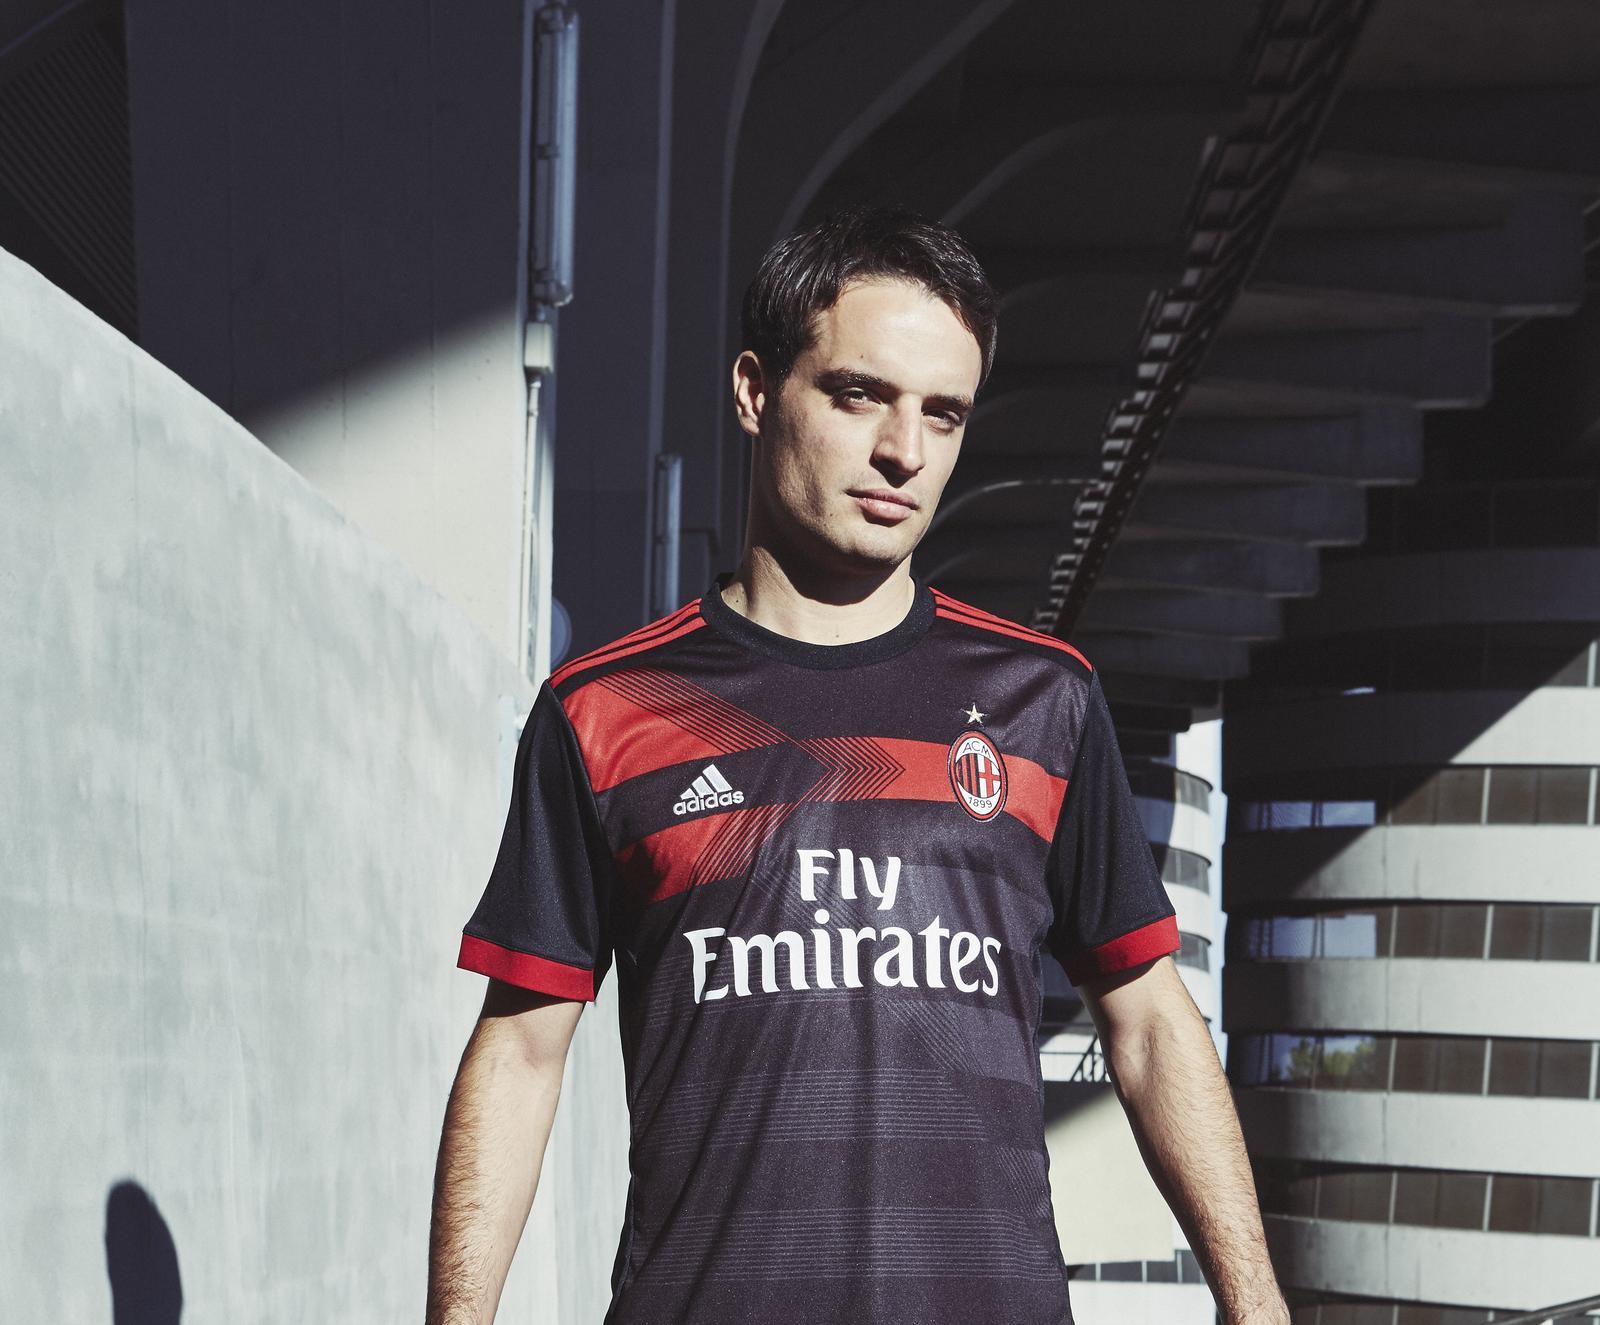 Maillot Extérieur AC Milan noir